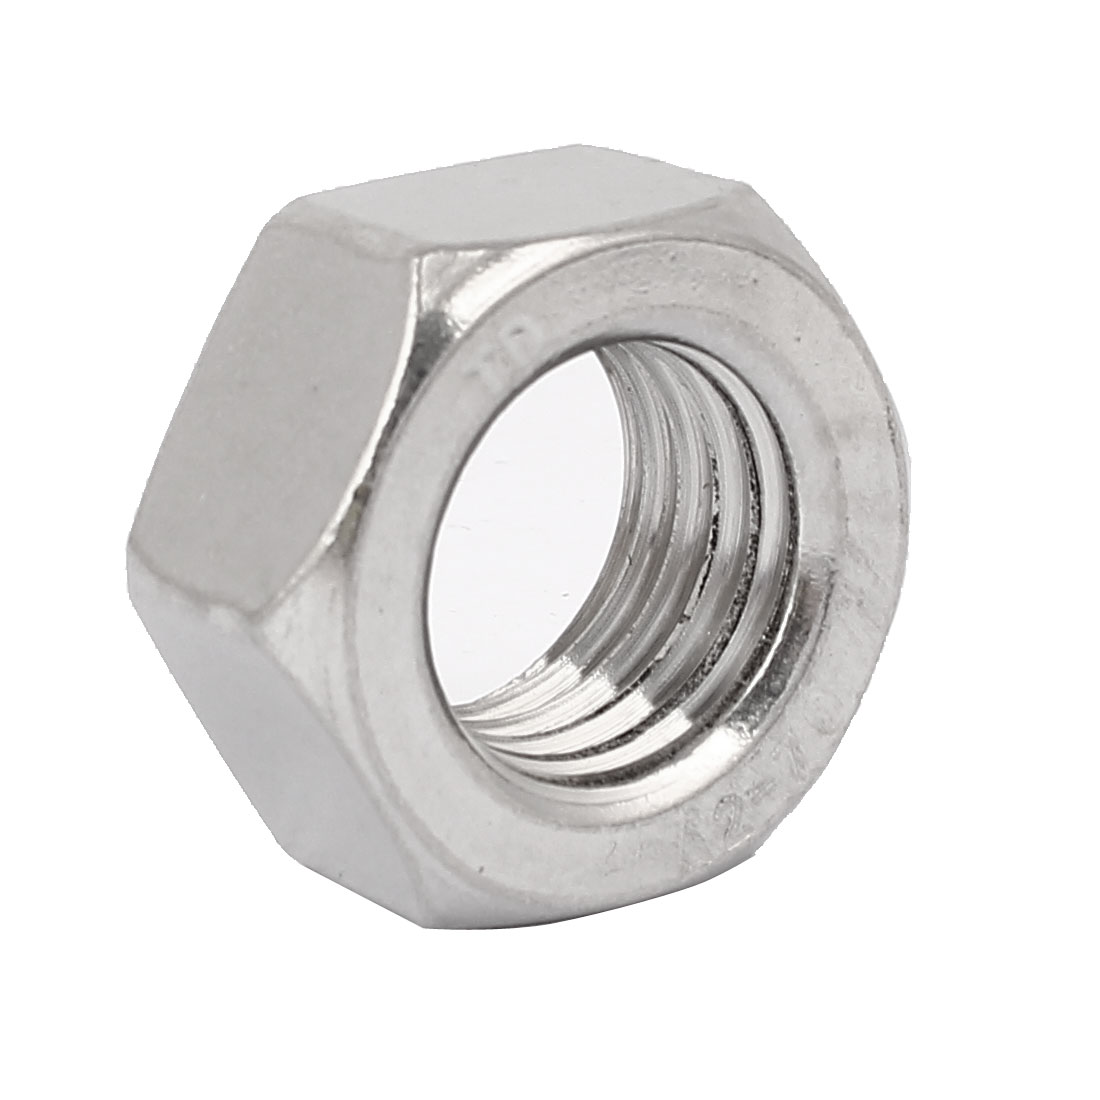 M30 Thread Dia 304 Stainless Steel Hex Nut Screw Cap Fastener Silver Tone